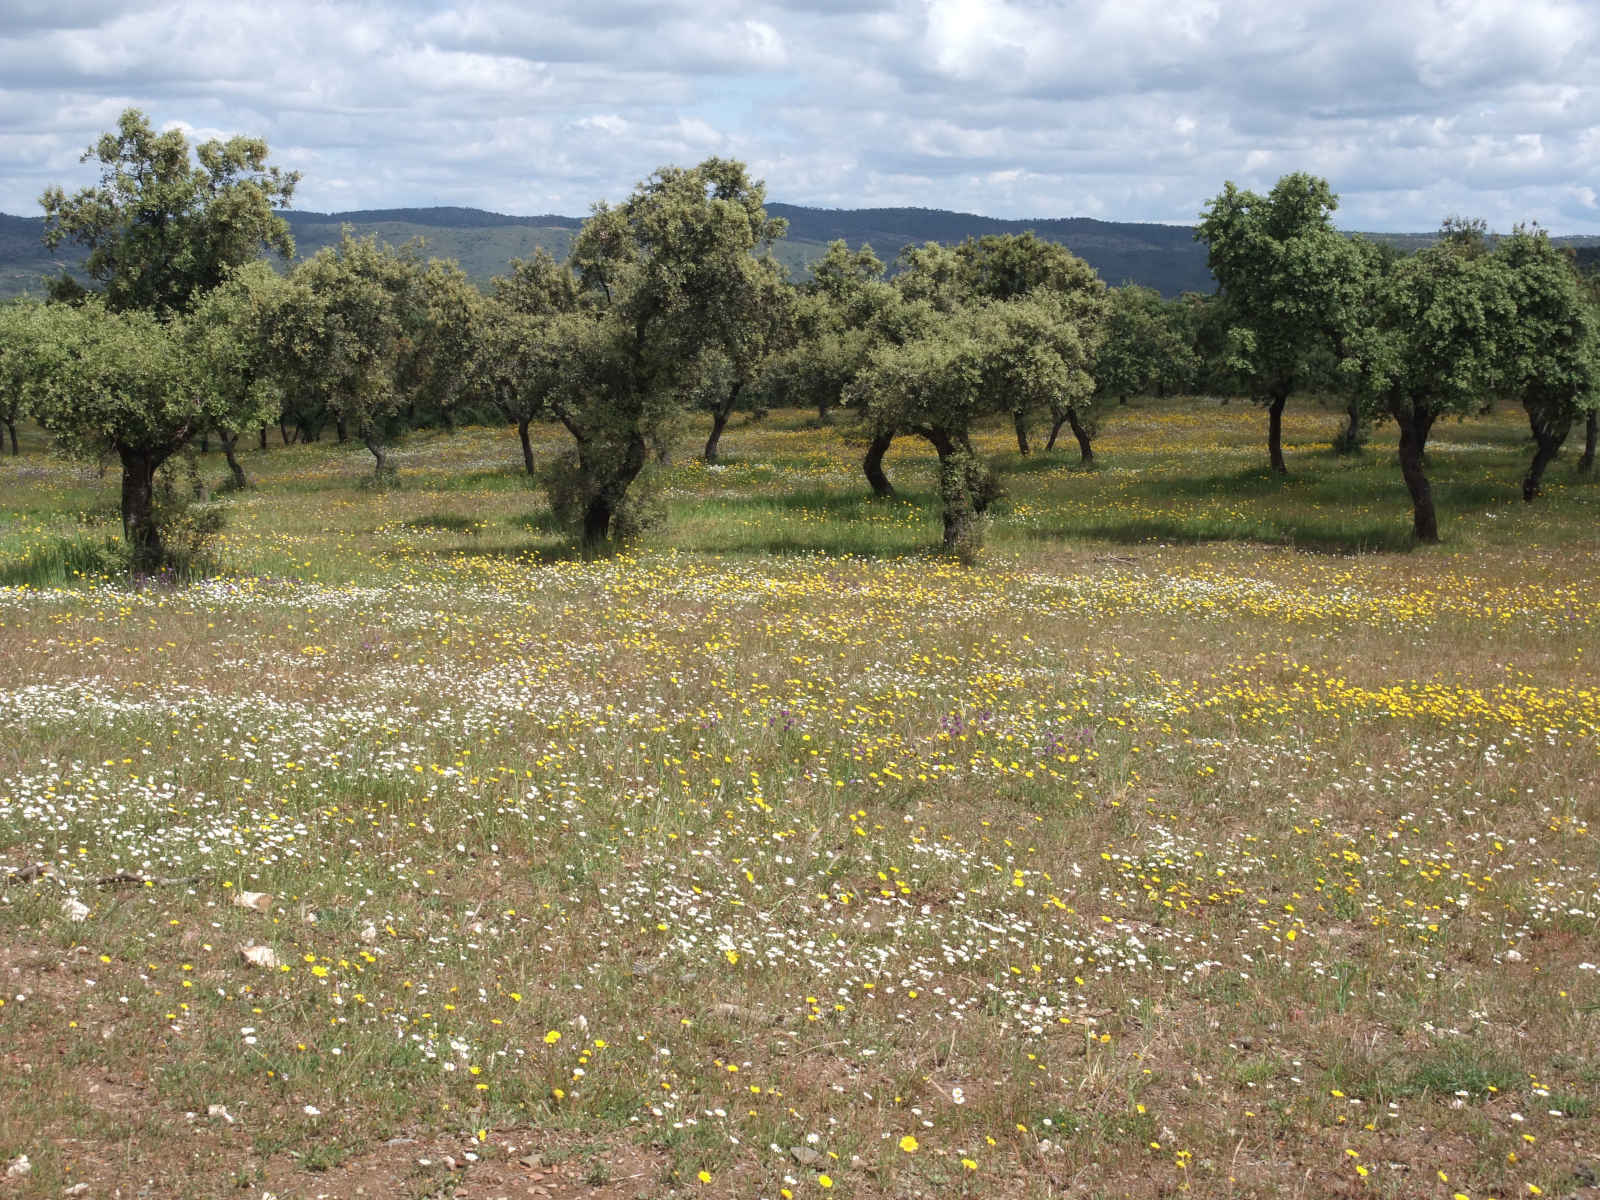 Pradera en Zona de Dehesa - CANTUESO - Natural Seeds